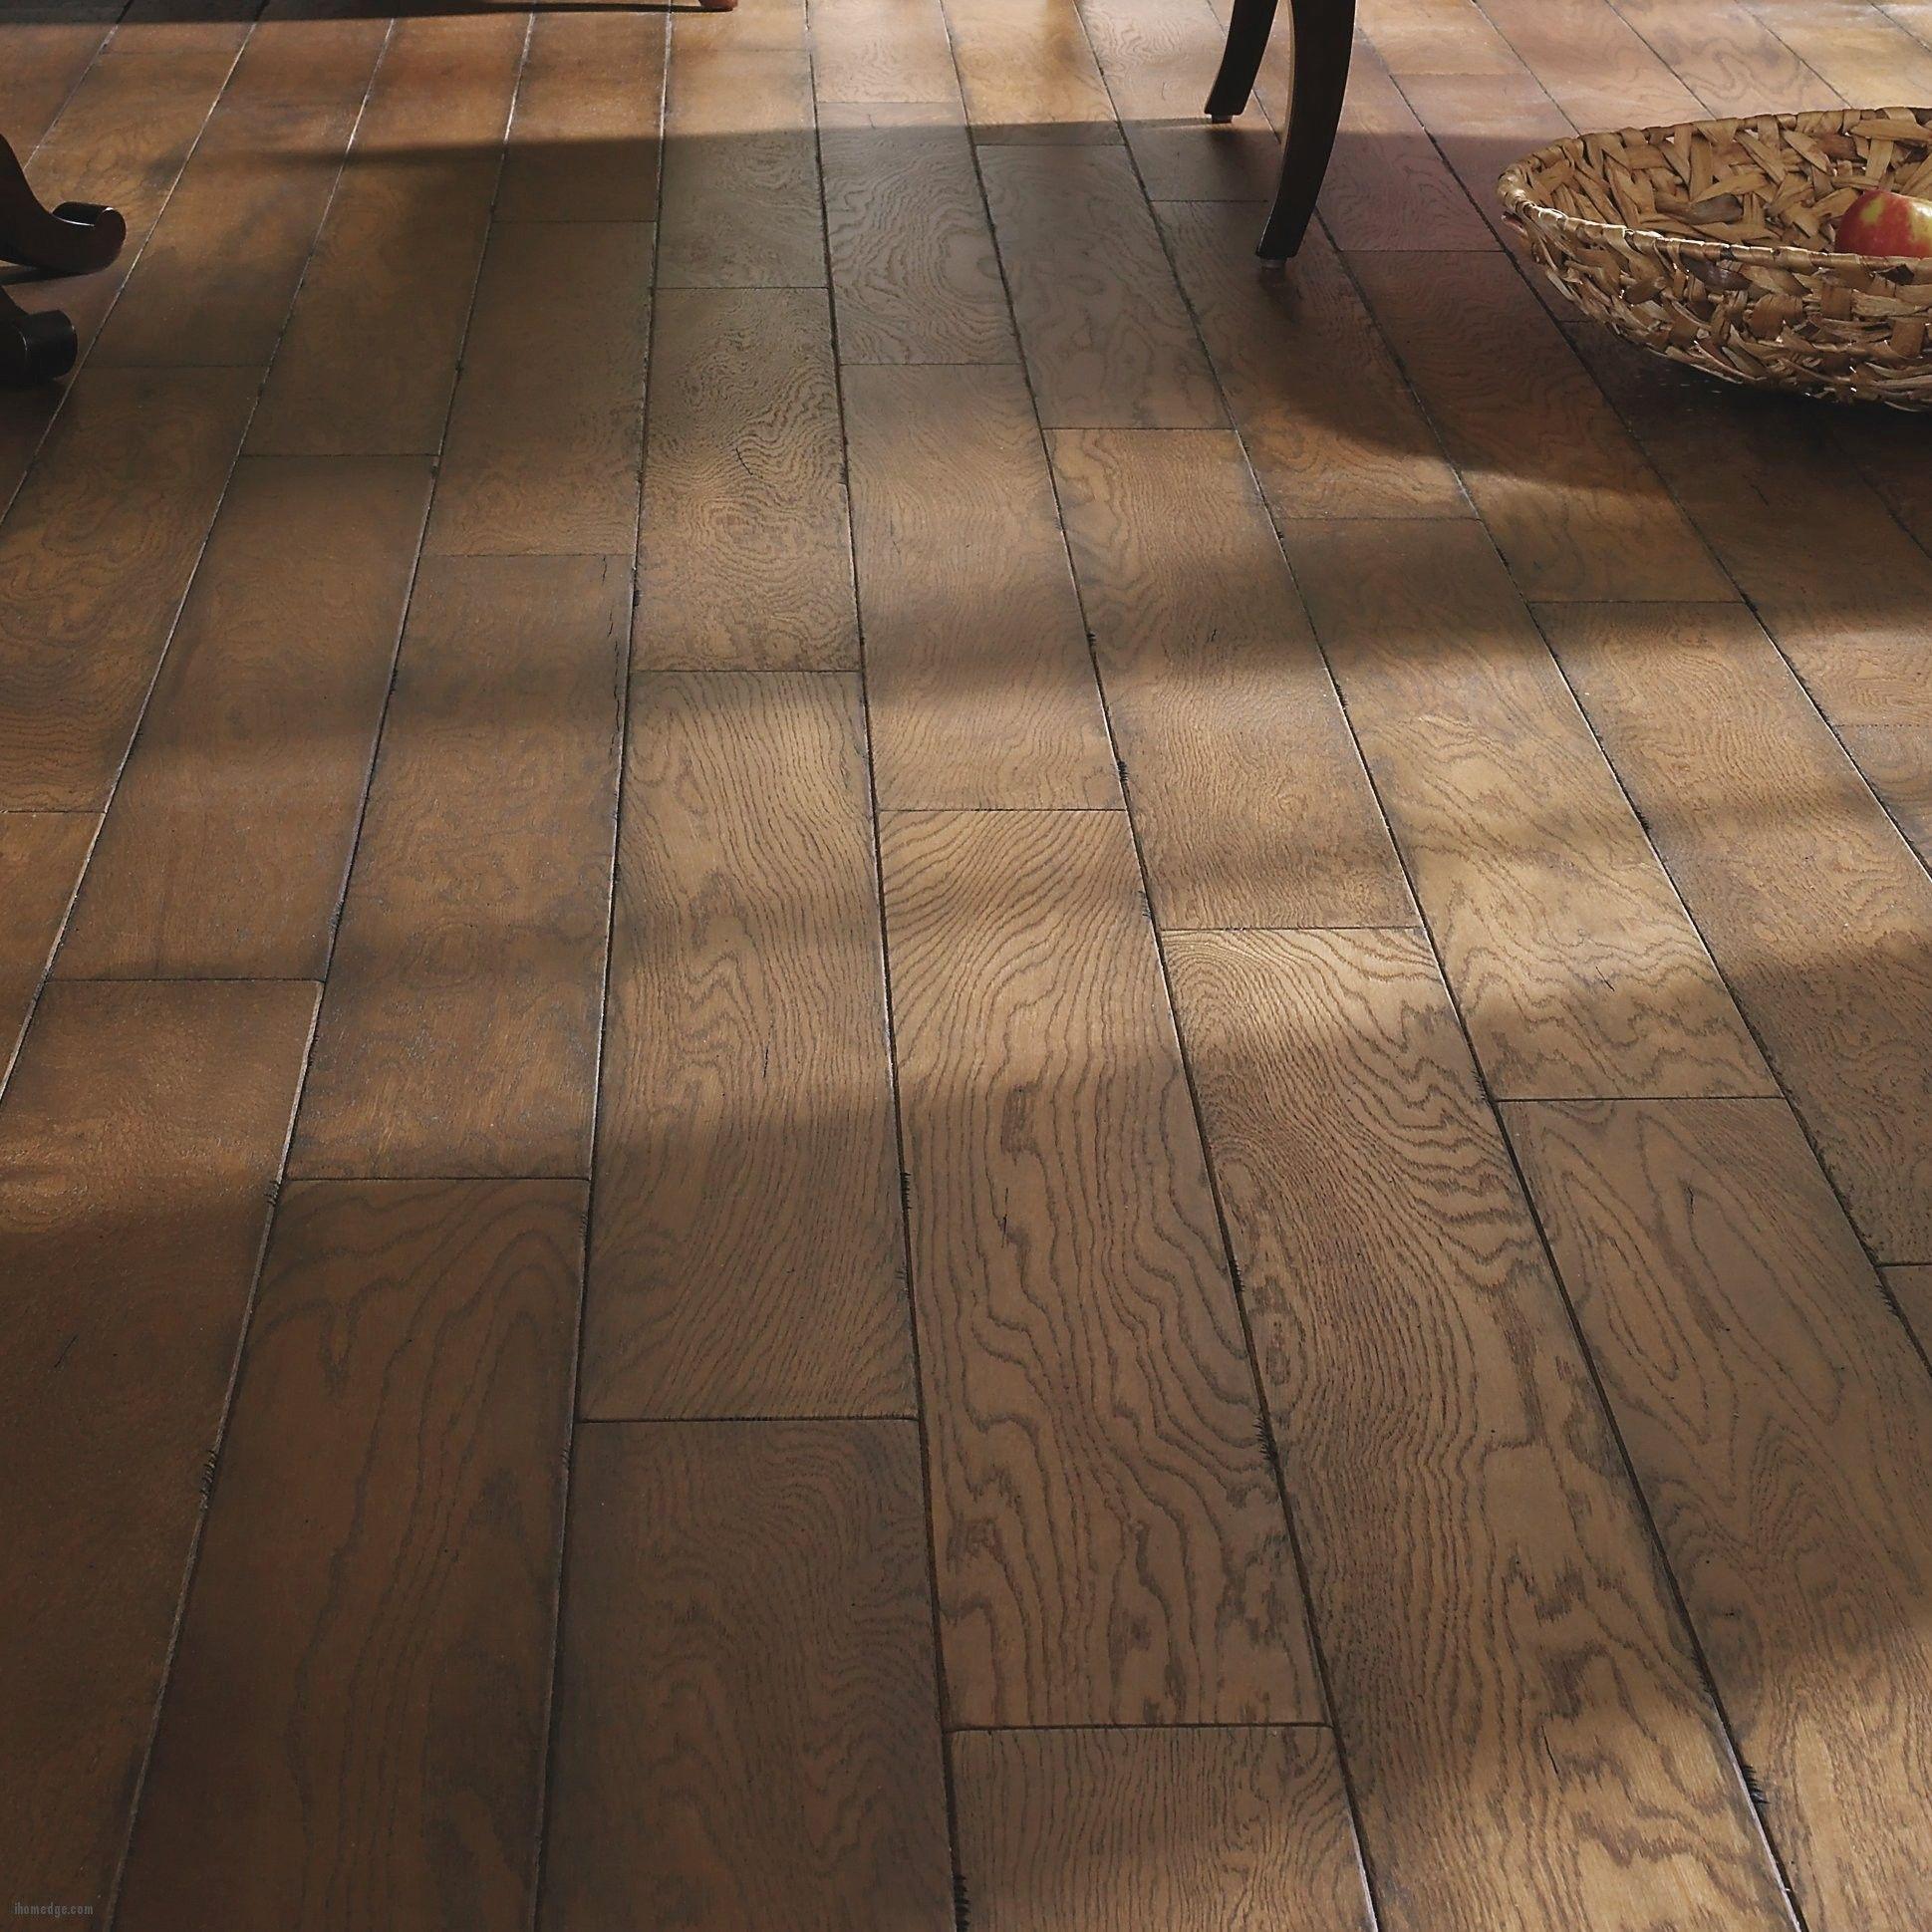 laminate and hardwood flooring difference of difference between laminate and vinyl flooring floor in difference between laminate and vinyl flooring cool lovely white oak hardwood flooring easoon usa 5 engineered